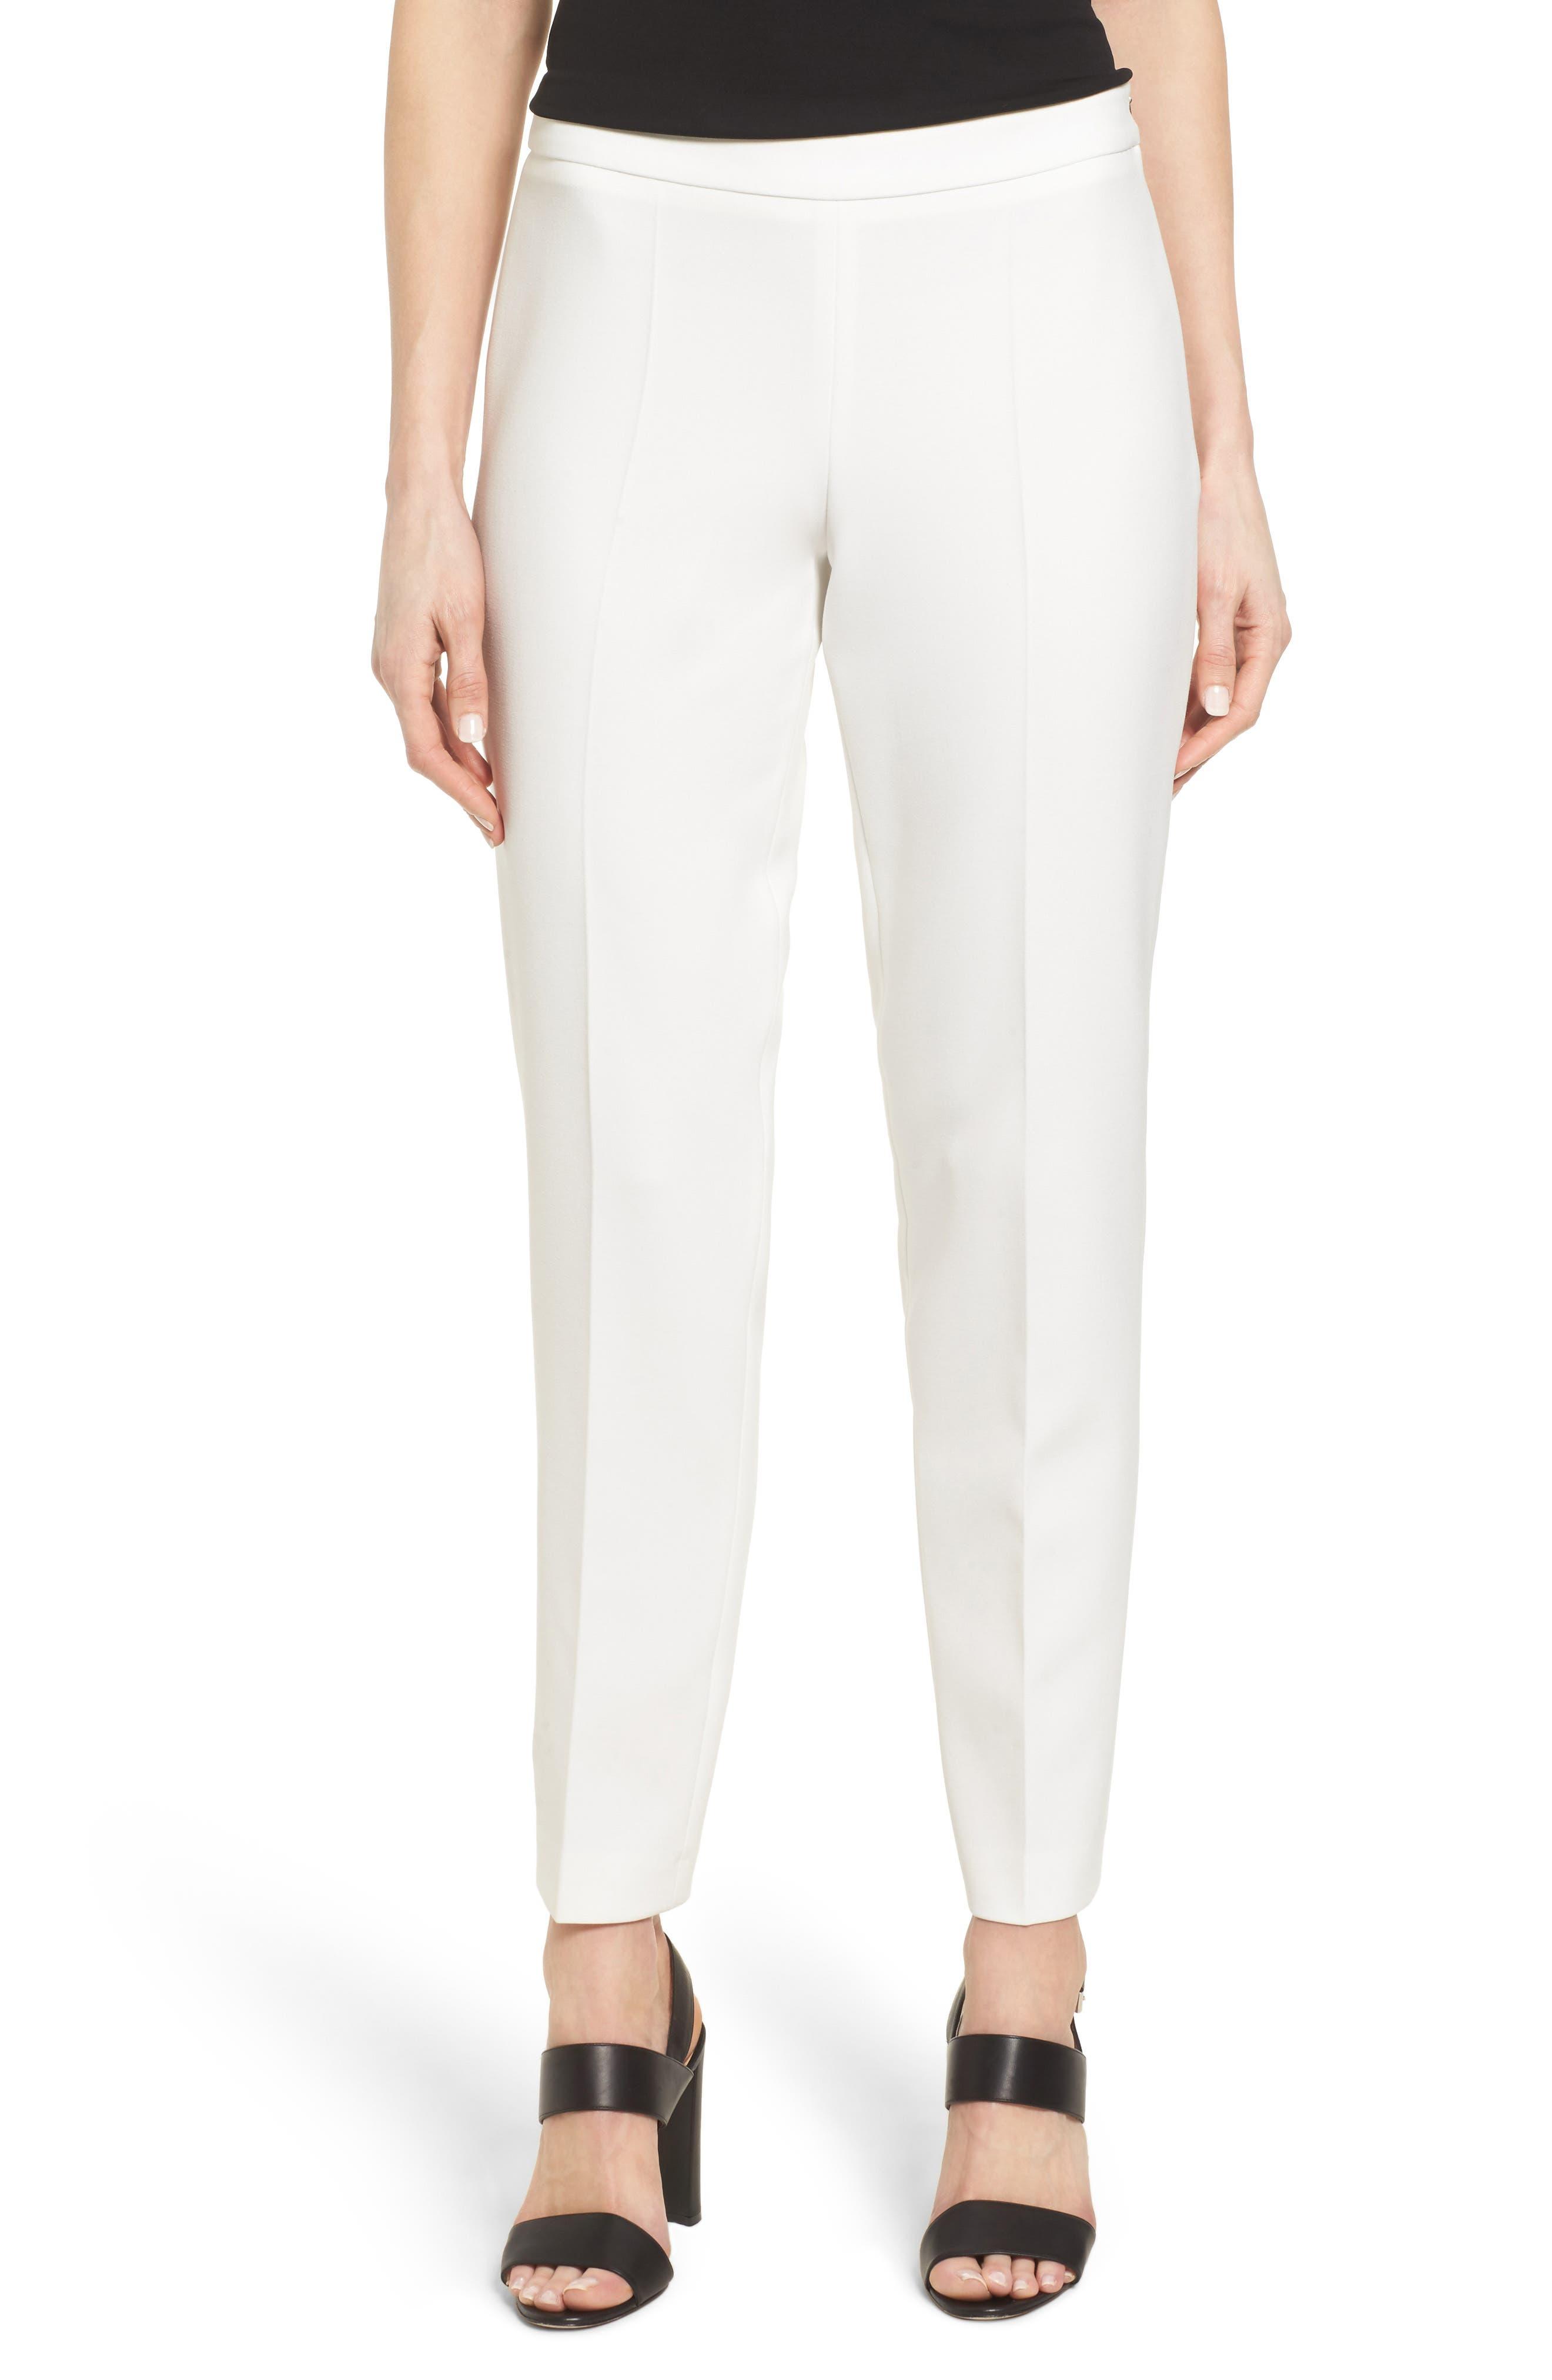 Alternate Image 1 Selected - BOSS 'Tiluna' Slim Leg Ankle Trousers (Regular & Petite)